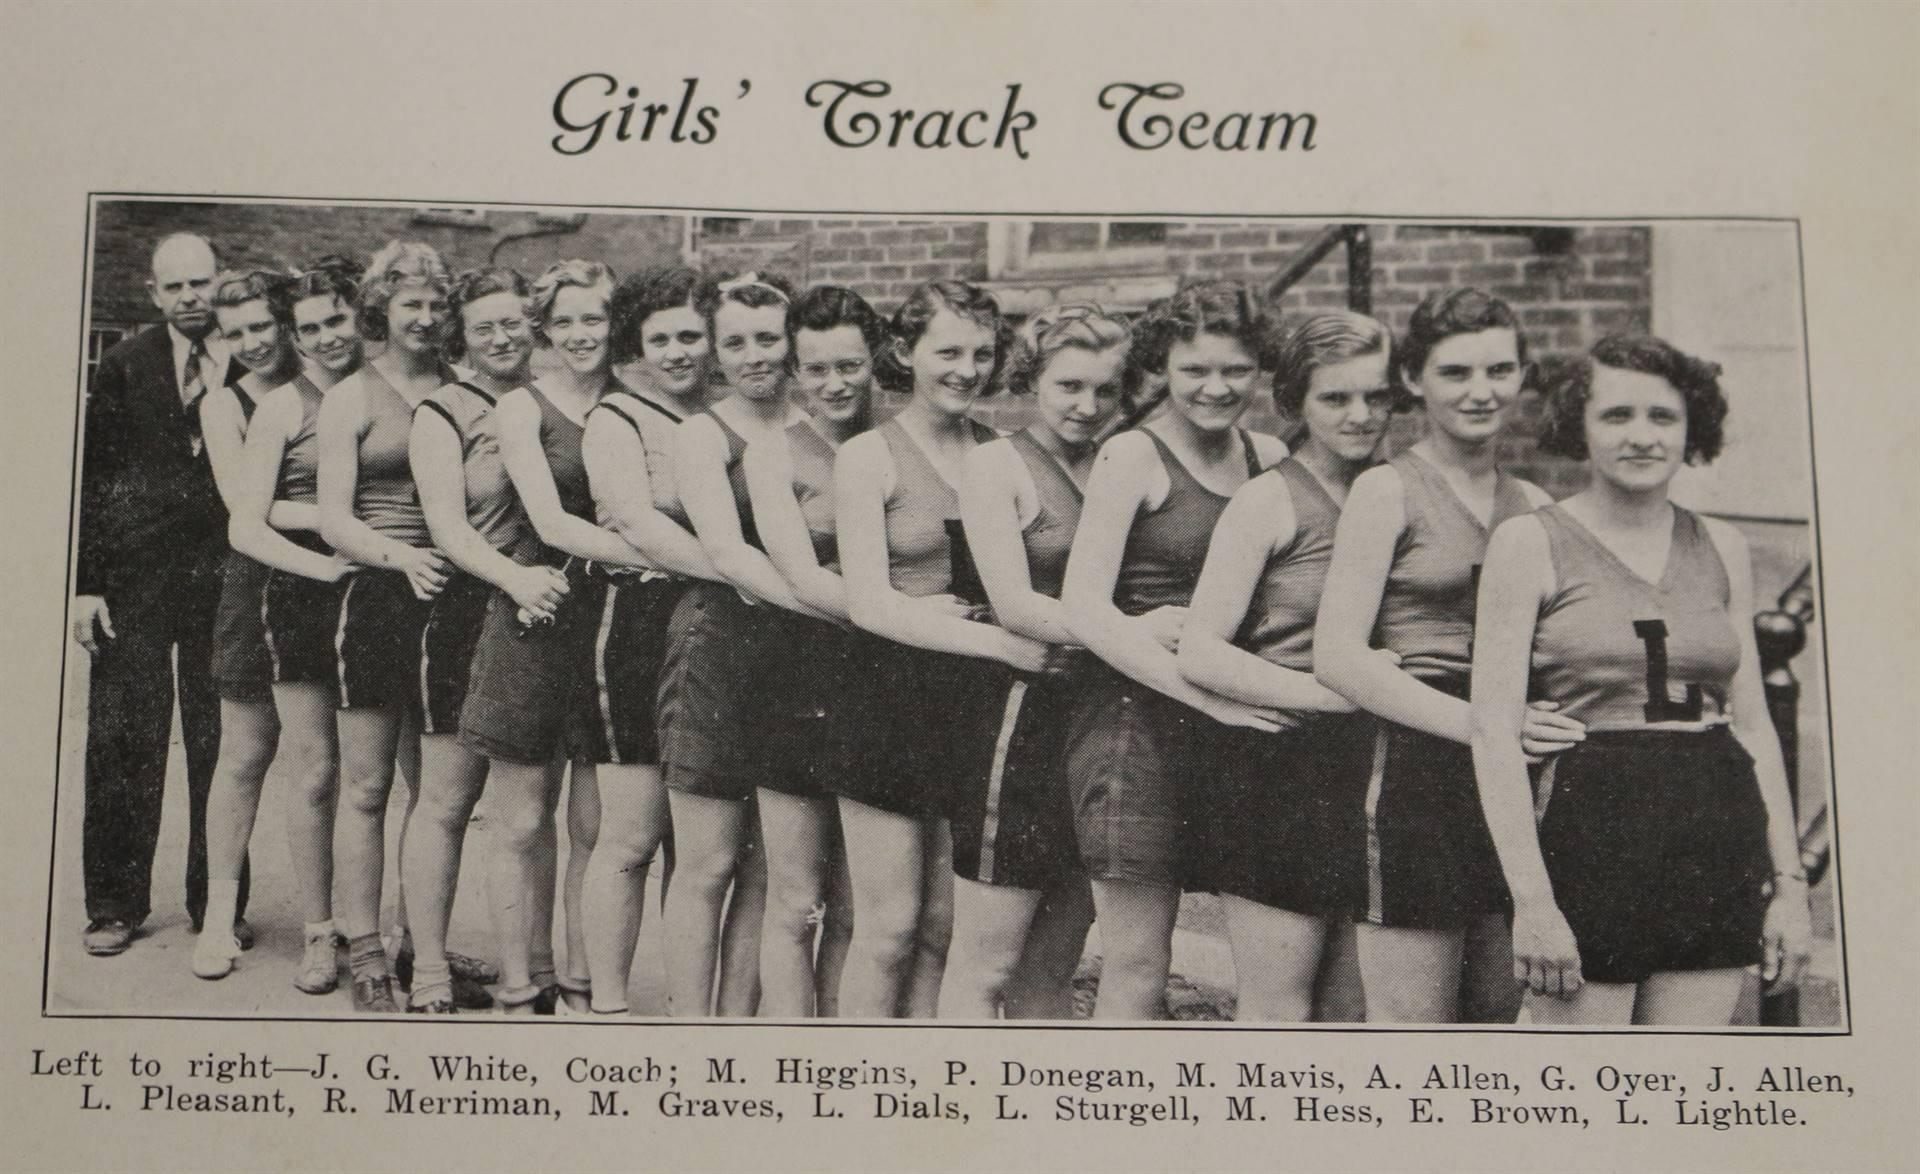 1937 Girls Track